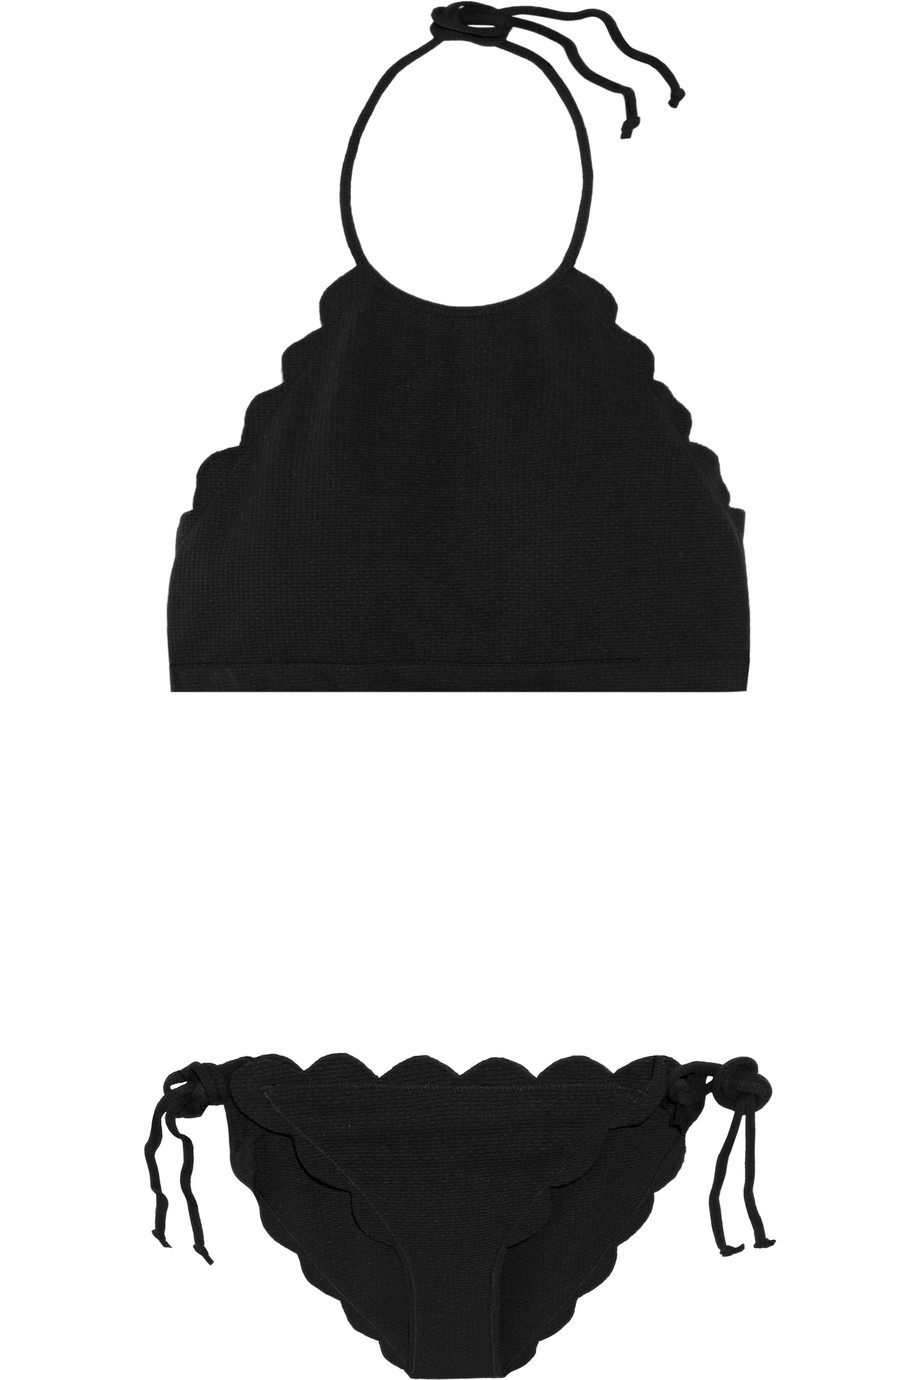 Marysia Mott Scalloped Halterneck Bikini, Black, Women's, Size: XS